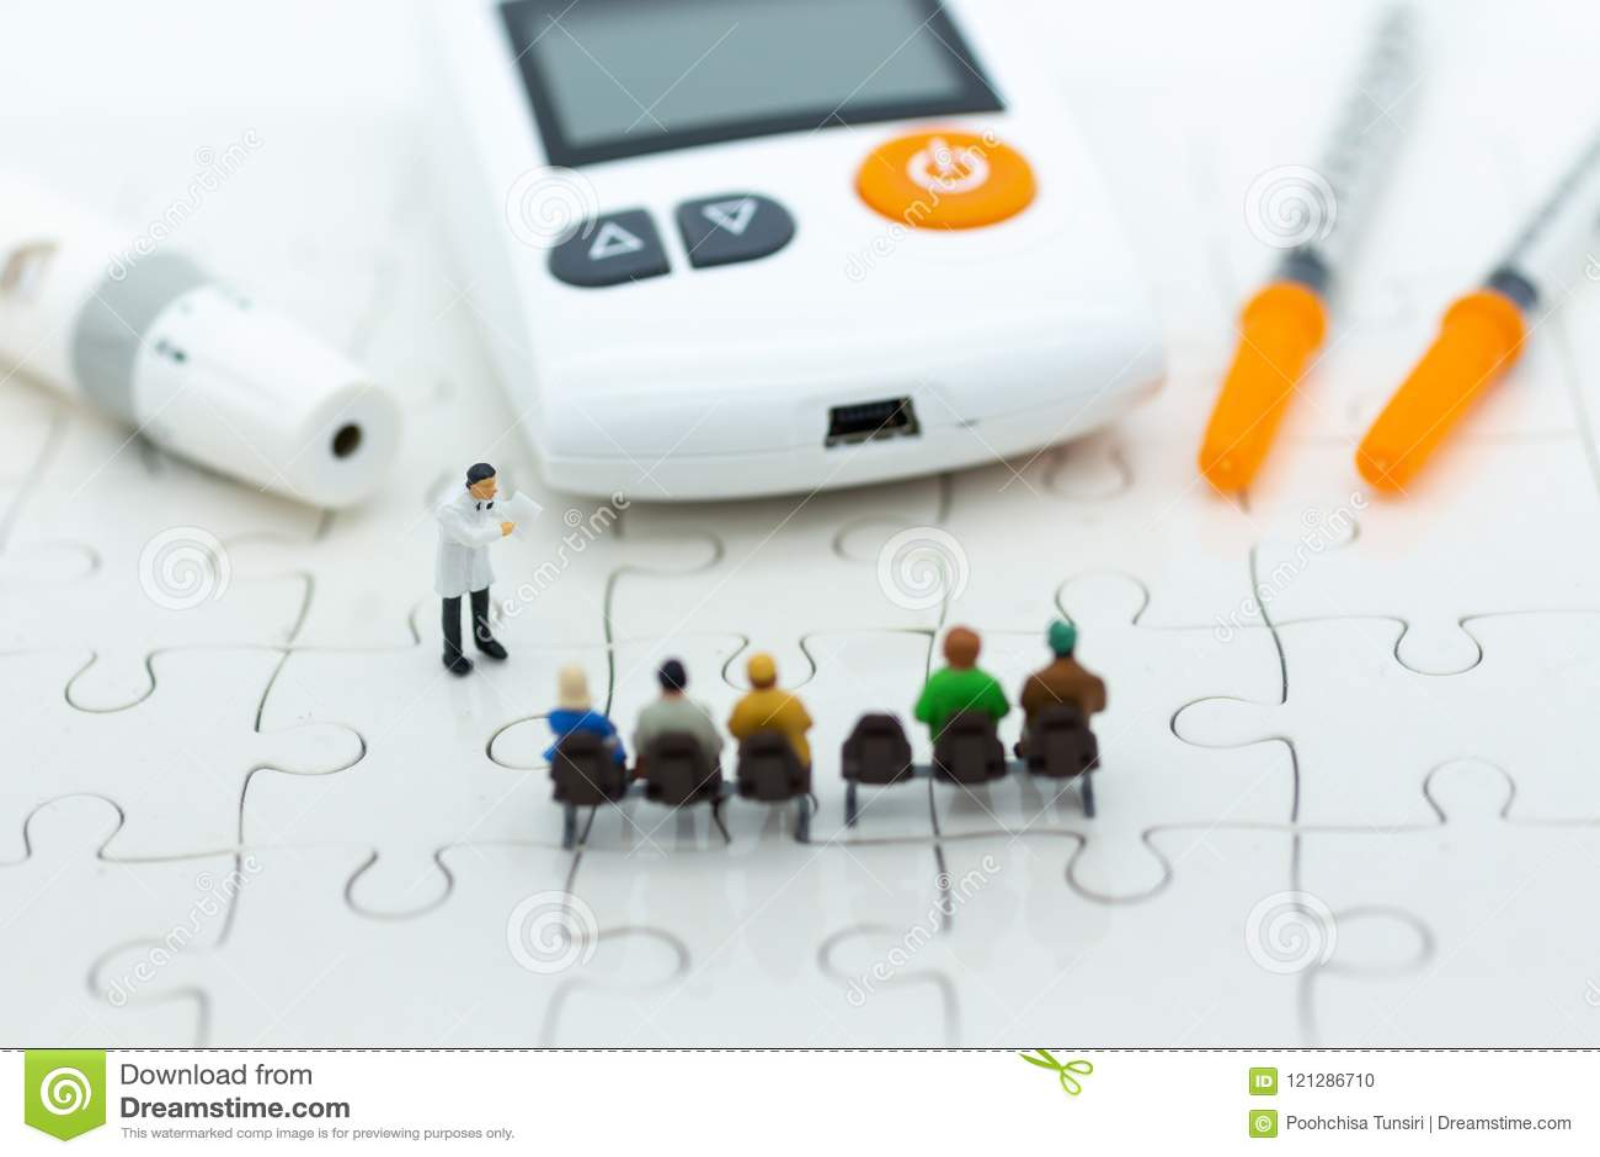 The use of glucose in medicine 44